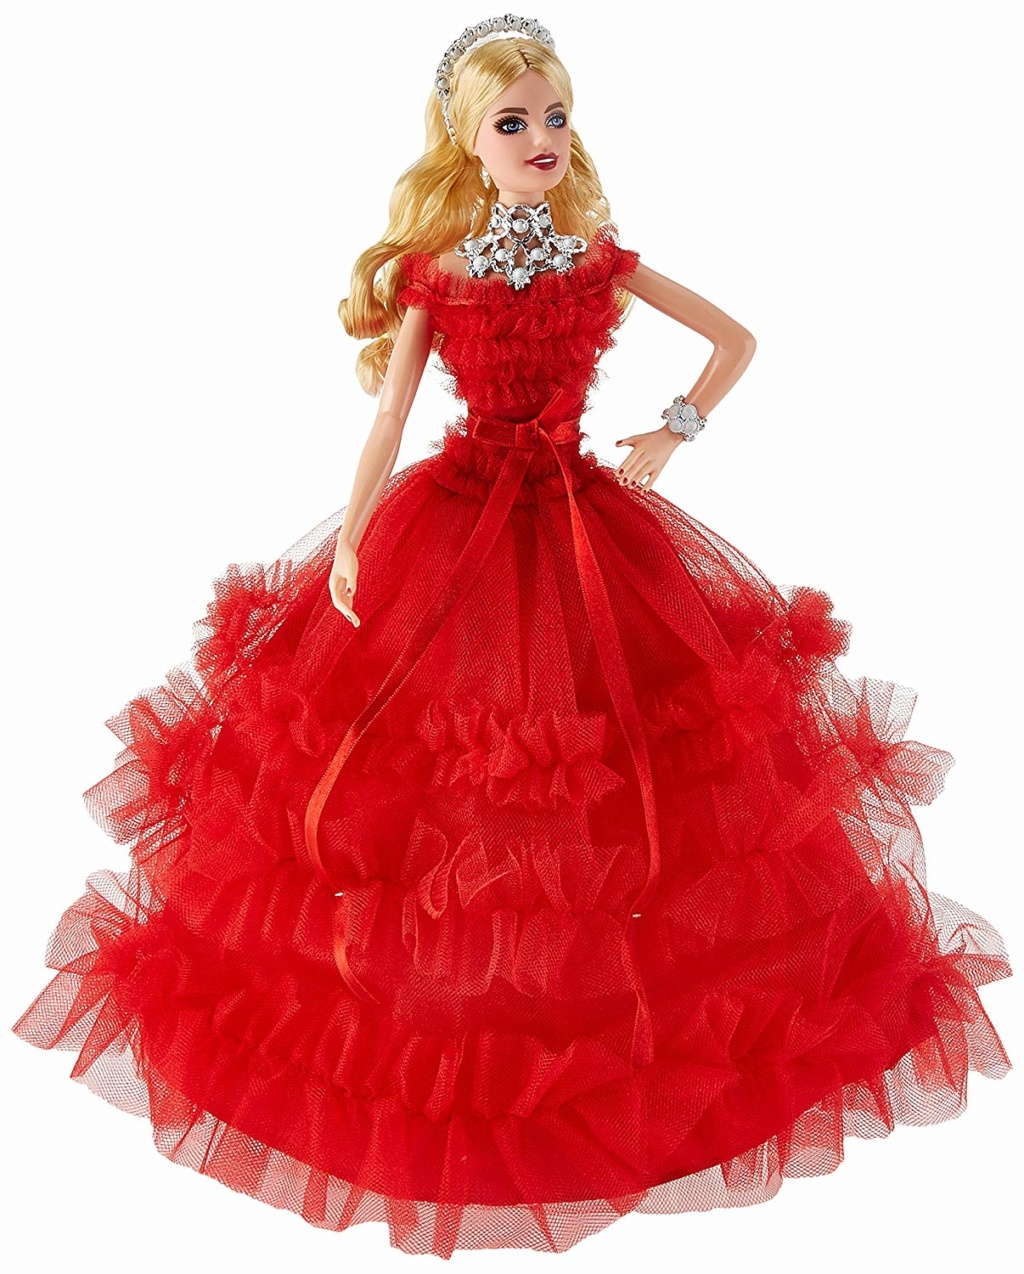 Barbie Happy Holiday 2018 Barbie10